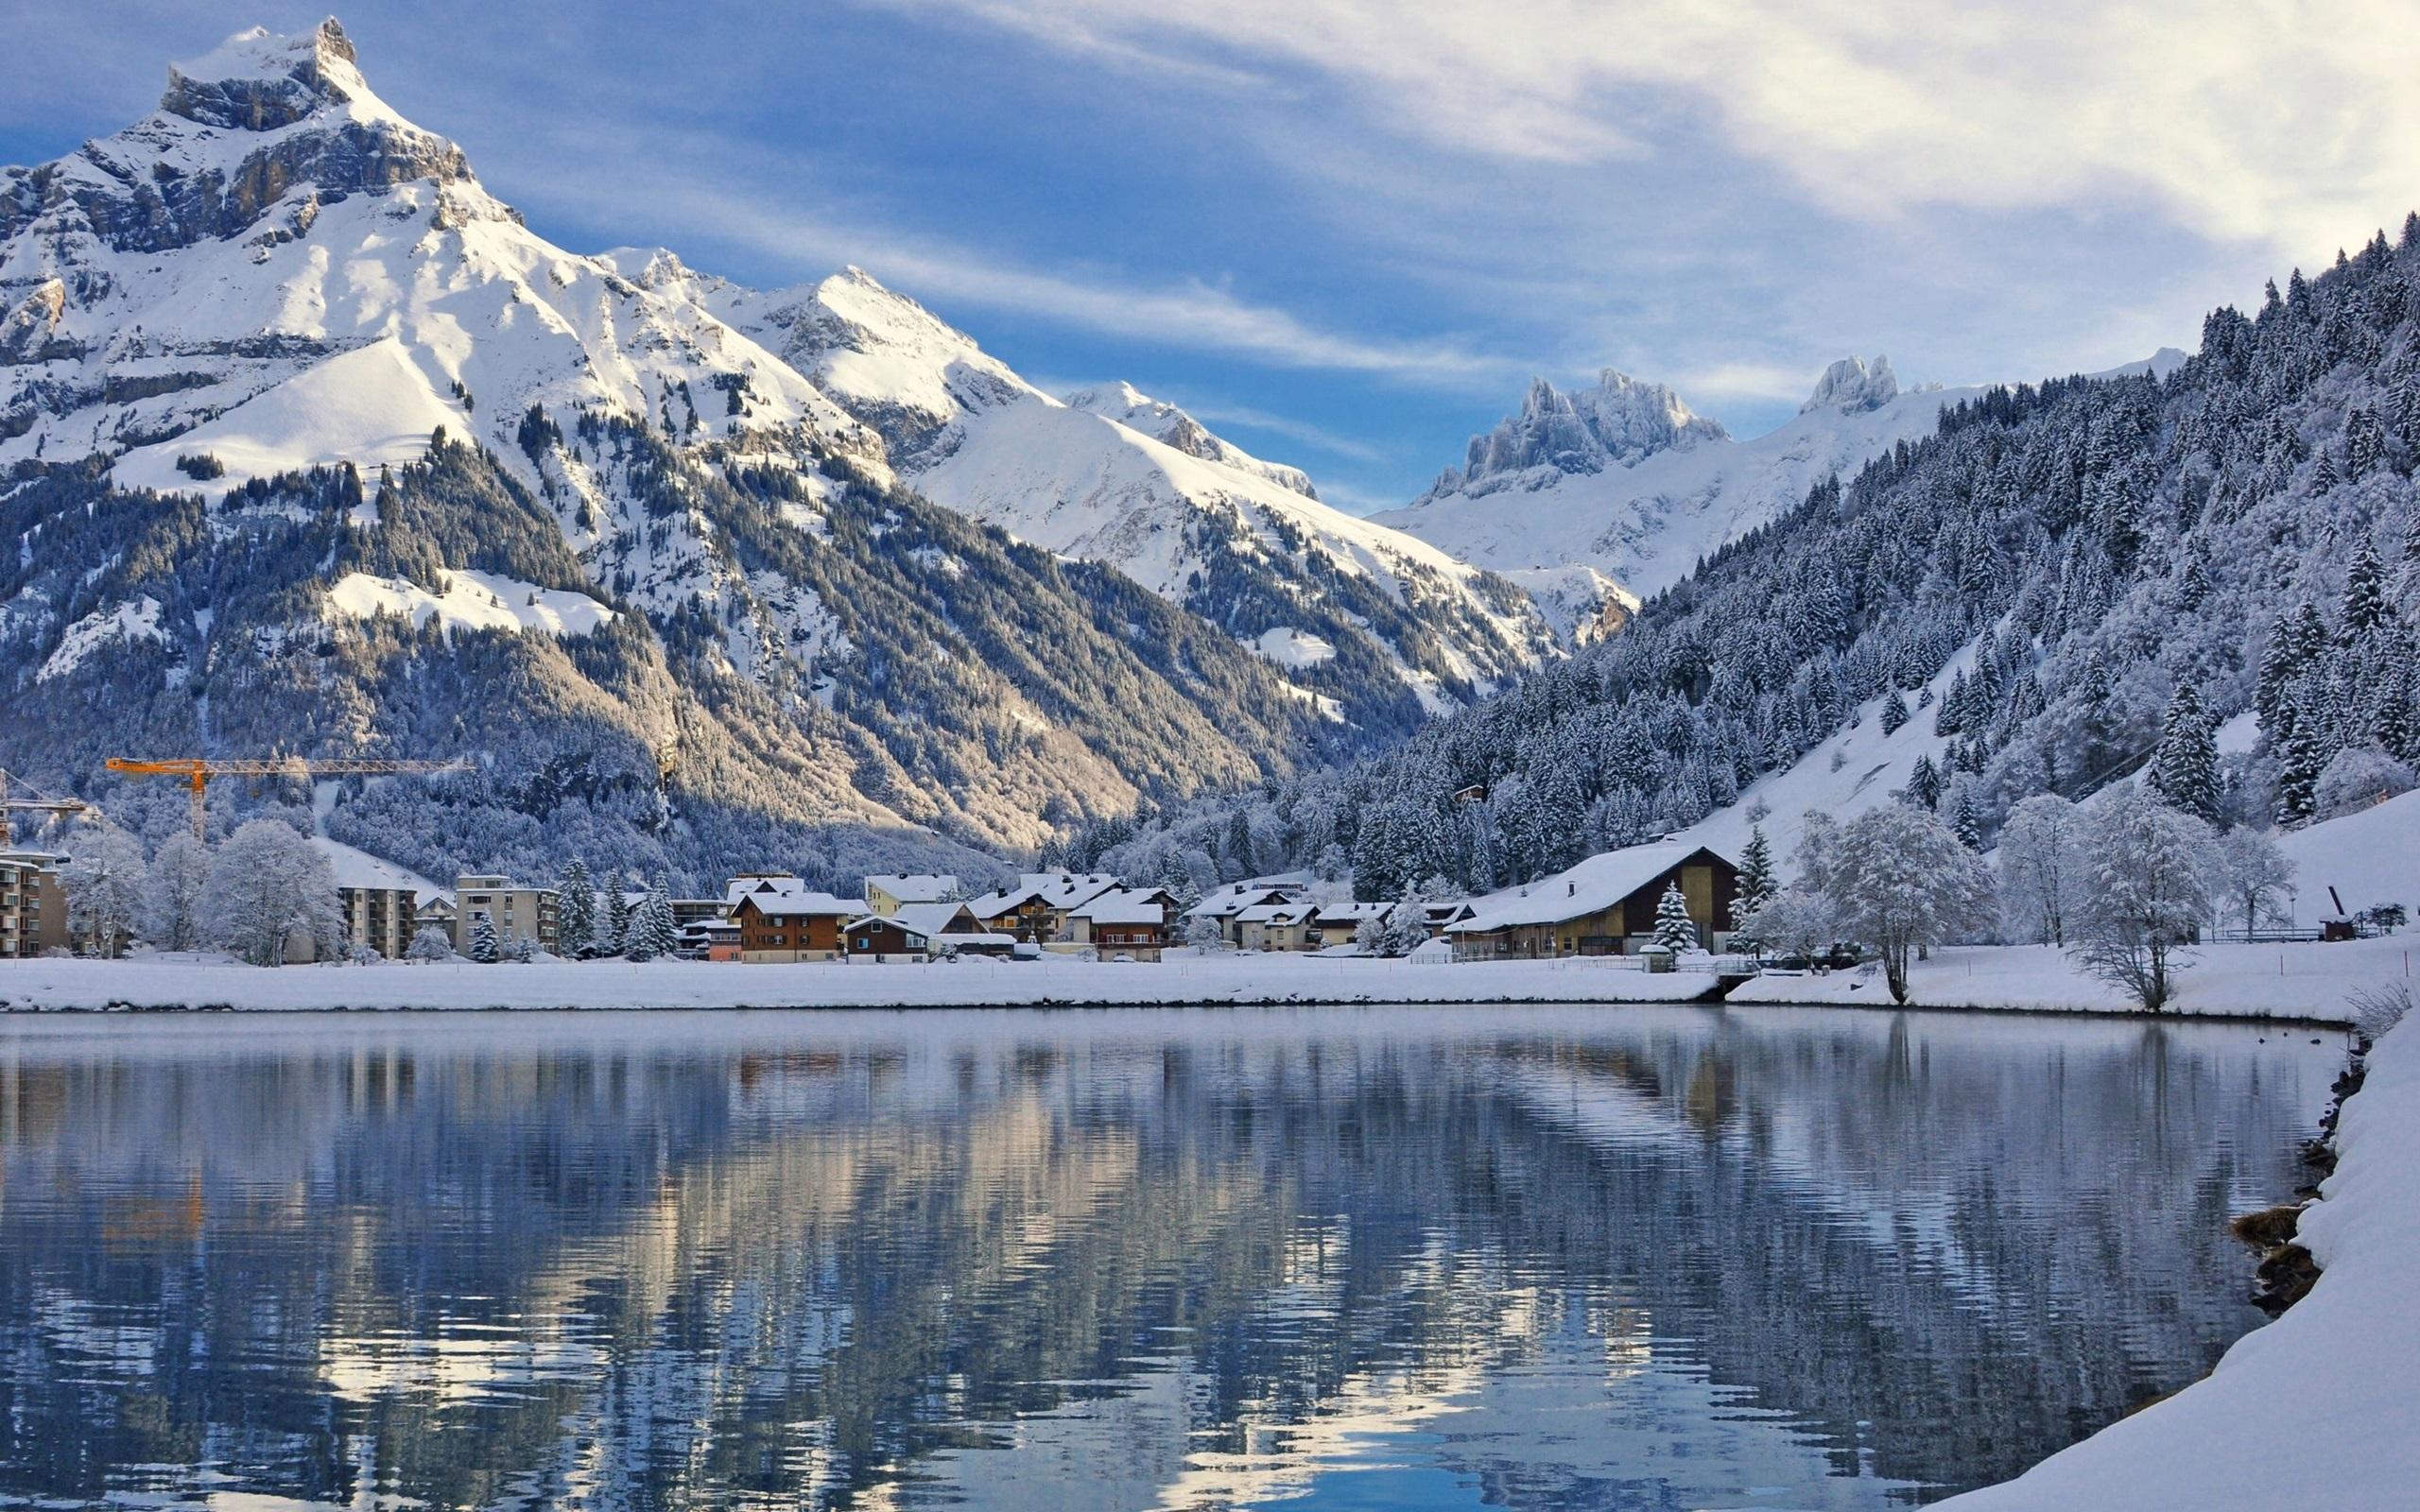 Lago Con Montañas Nevadas Hd: Fondos De Pantalla Engelberg, Suiza, Montañas, Nieve